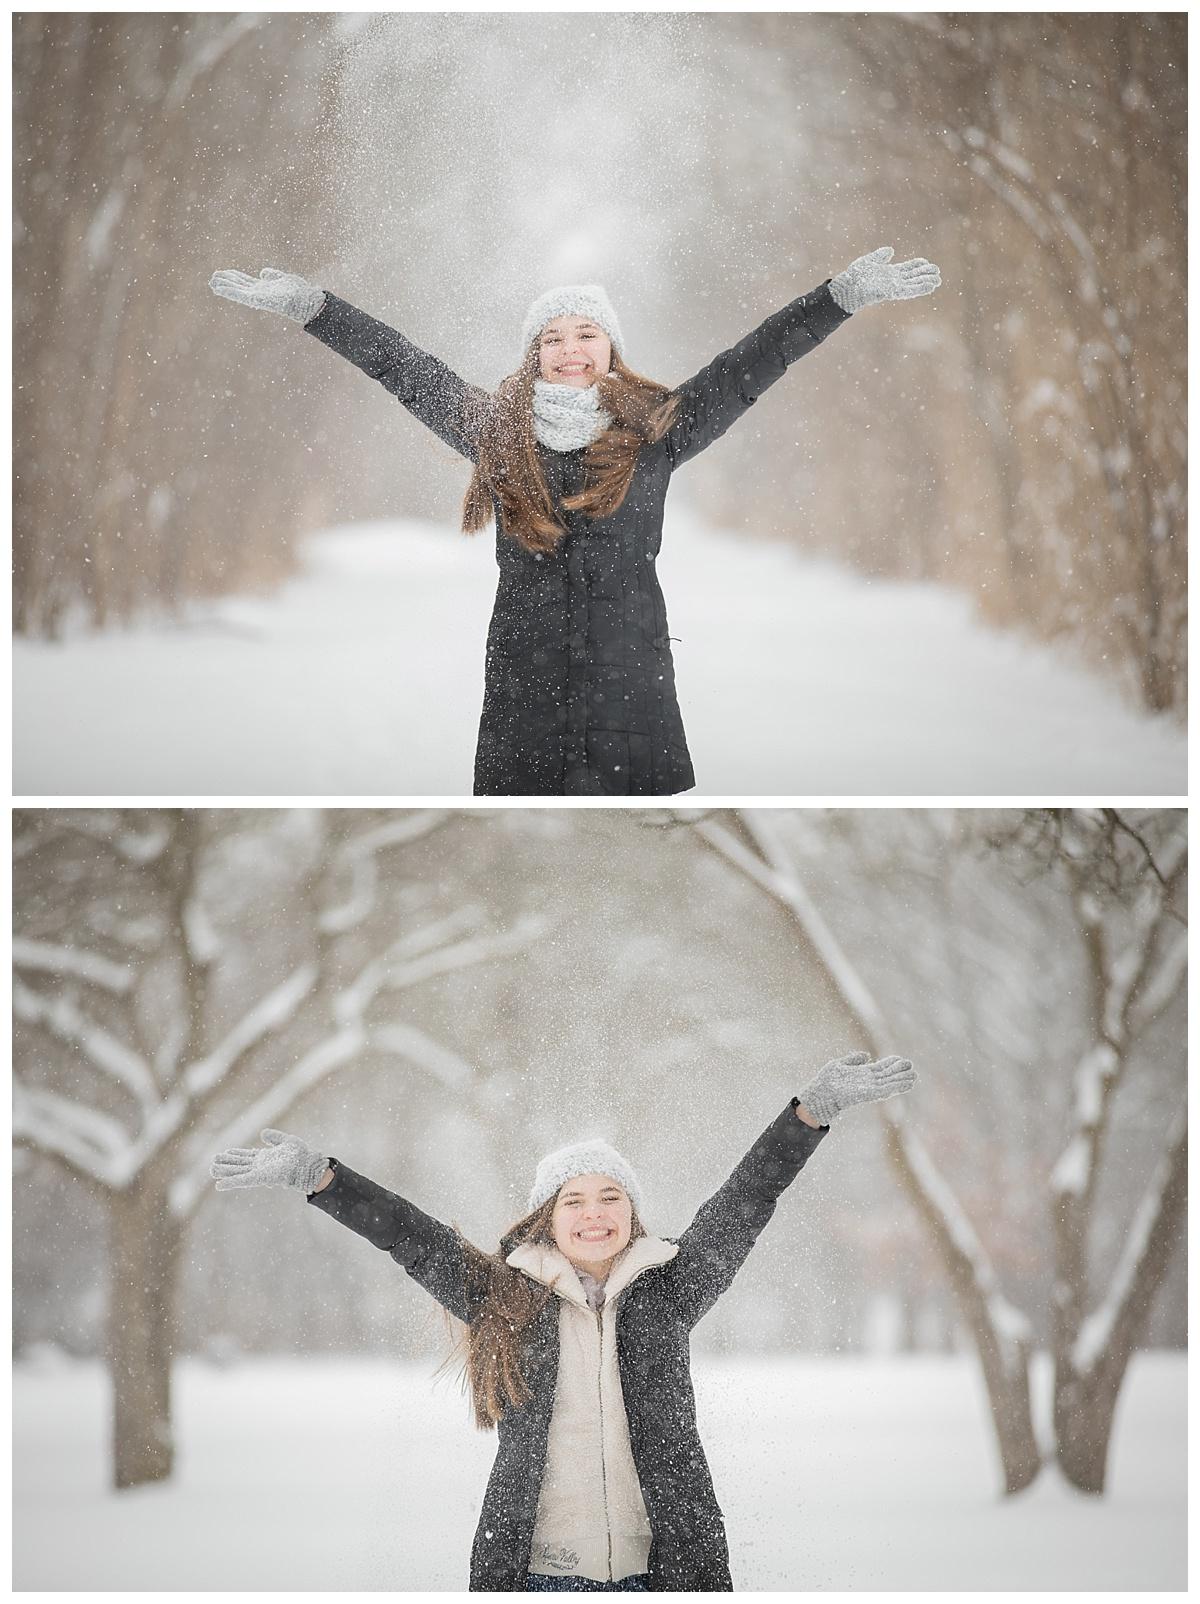 Adams High school fun in the snow at Rochester Park